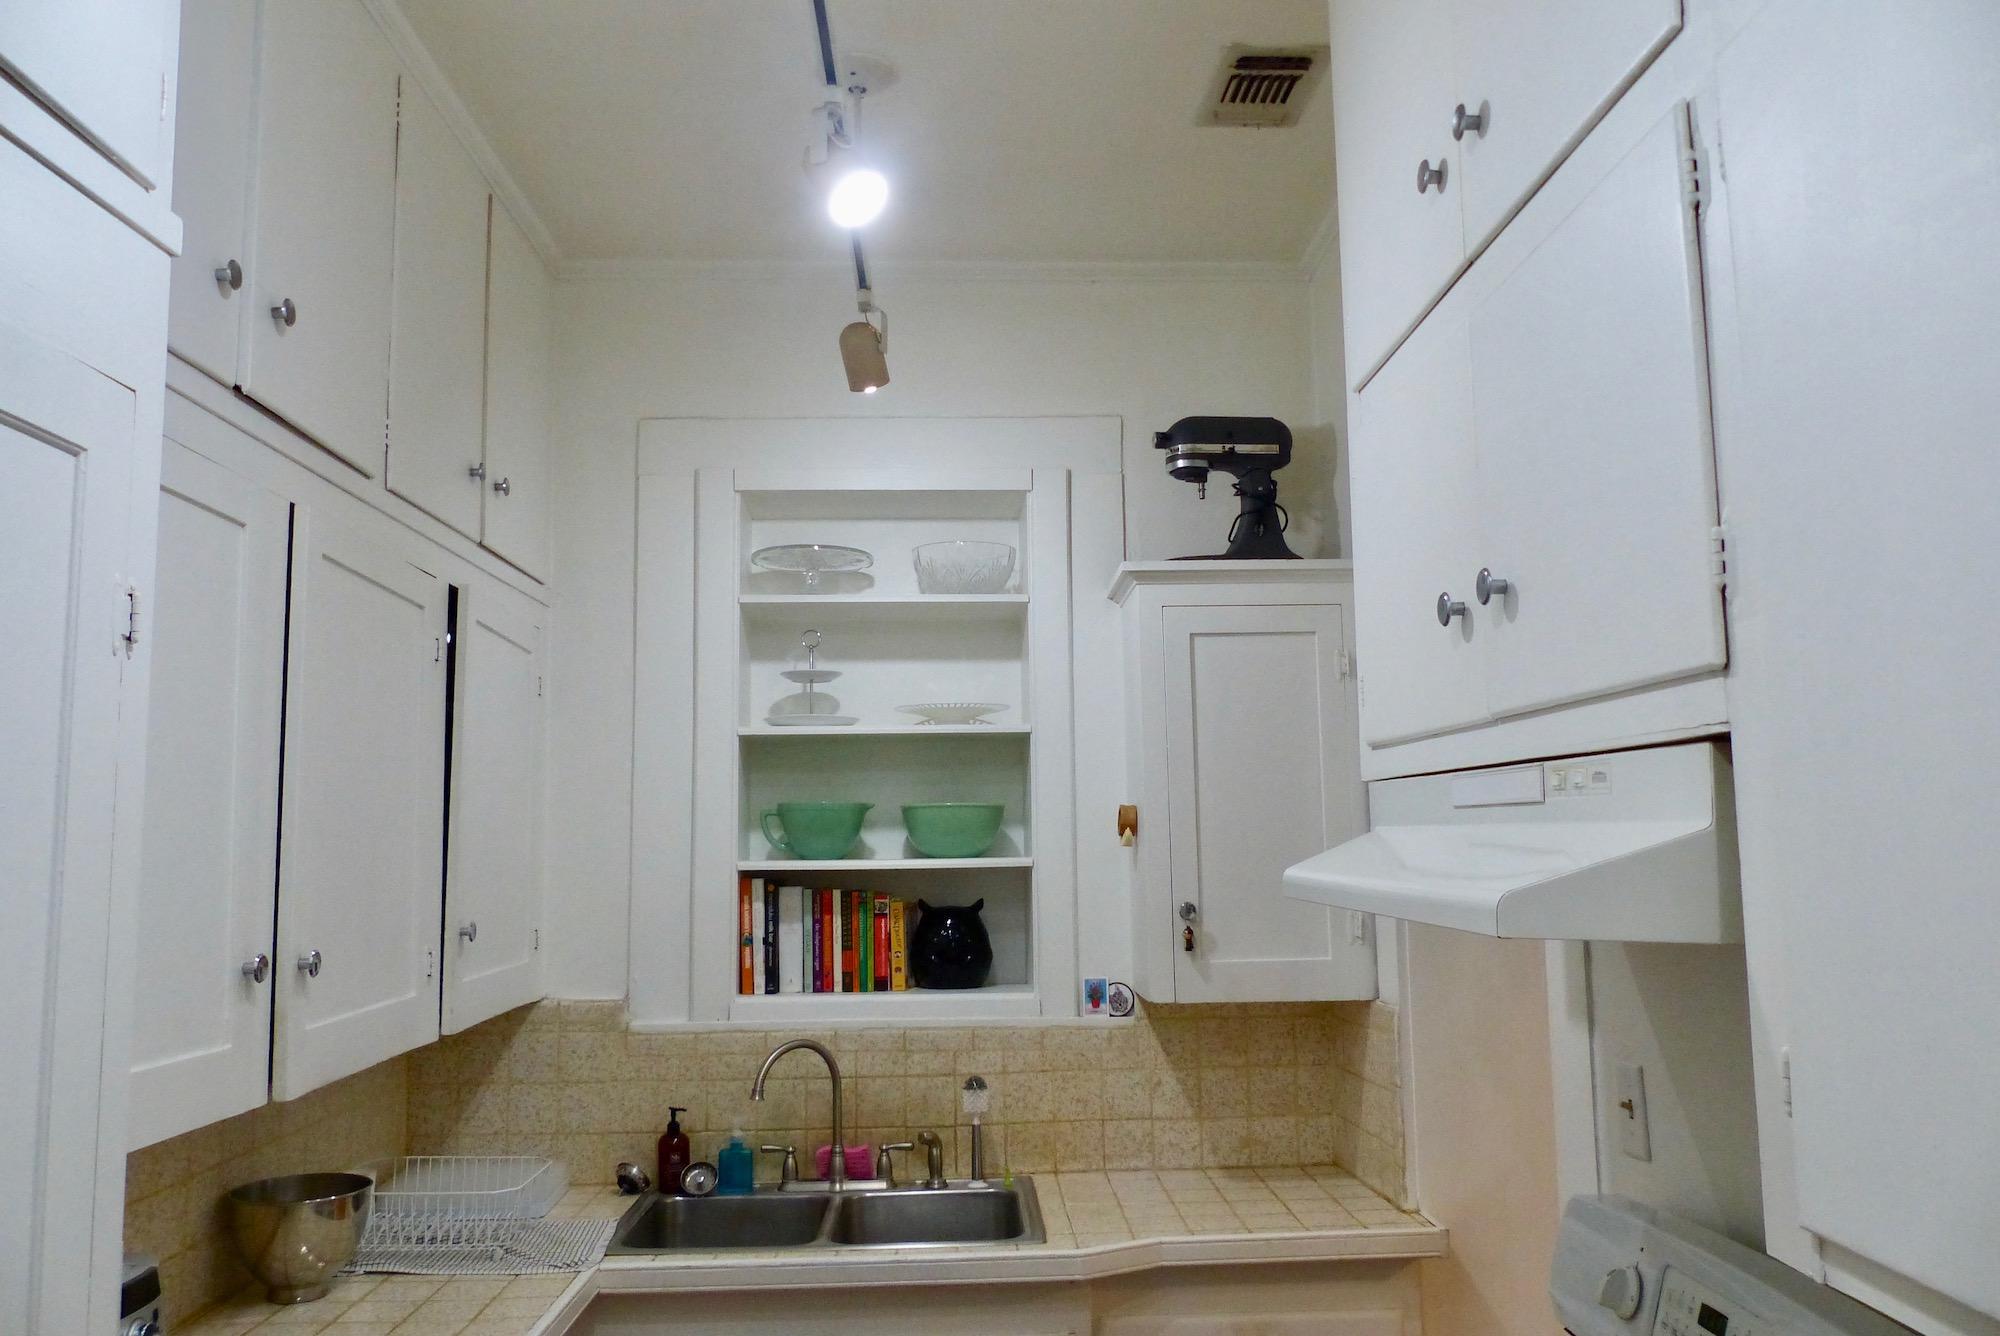 kitchensinkcabinets.jpg